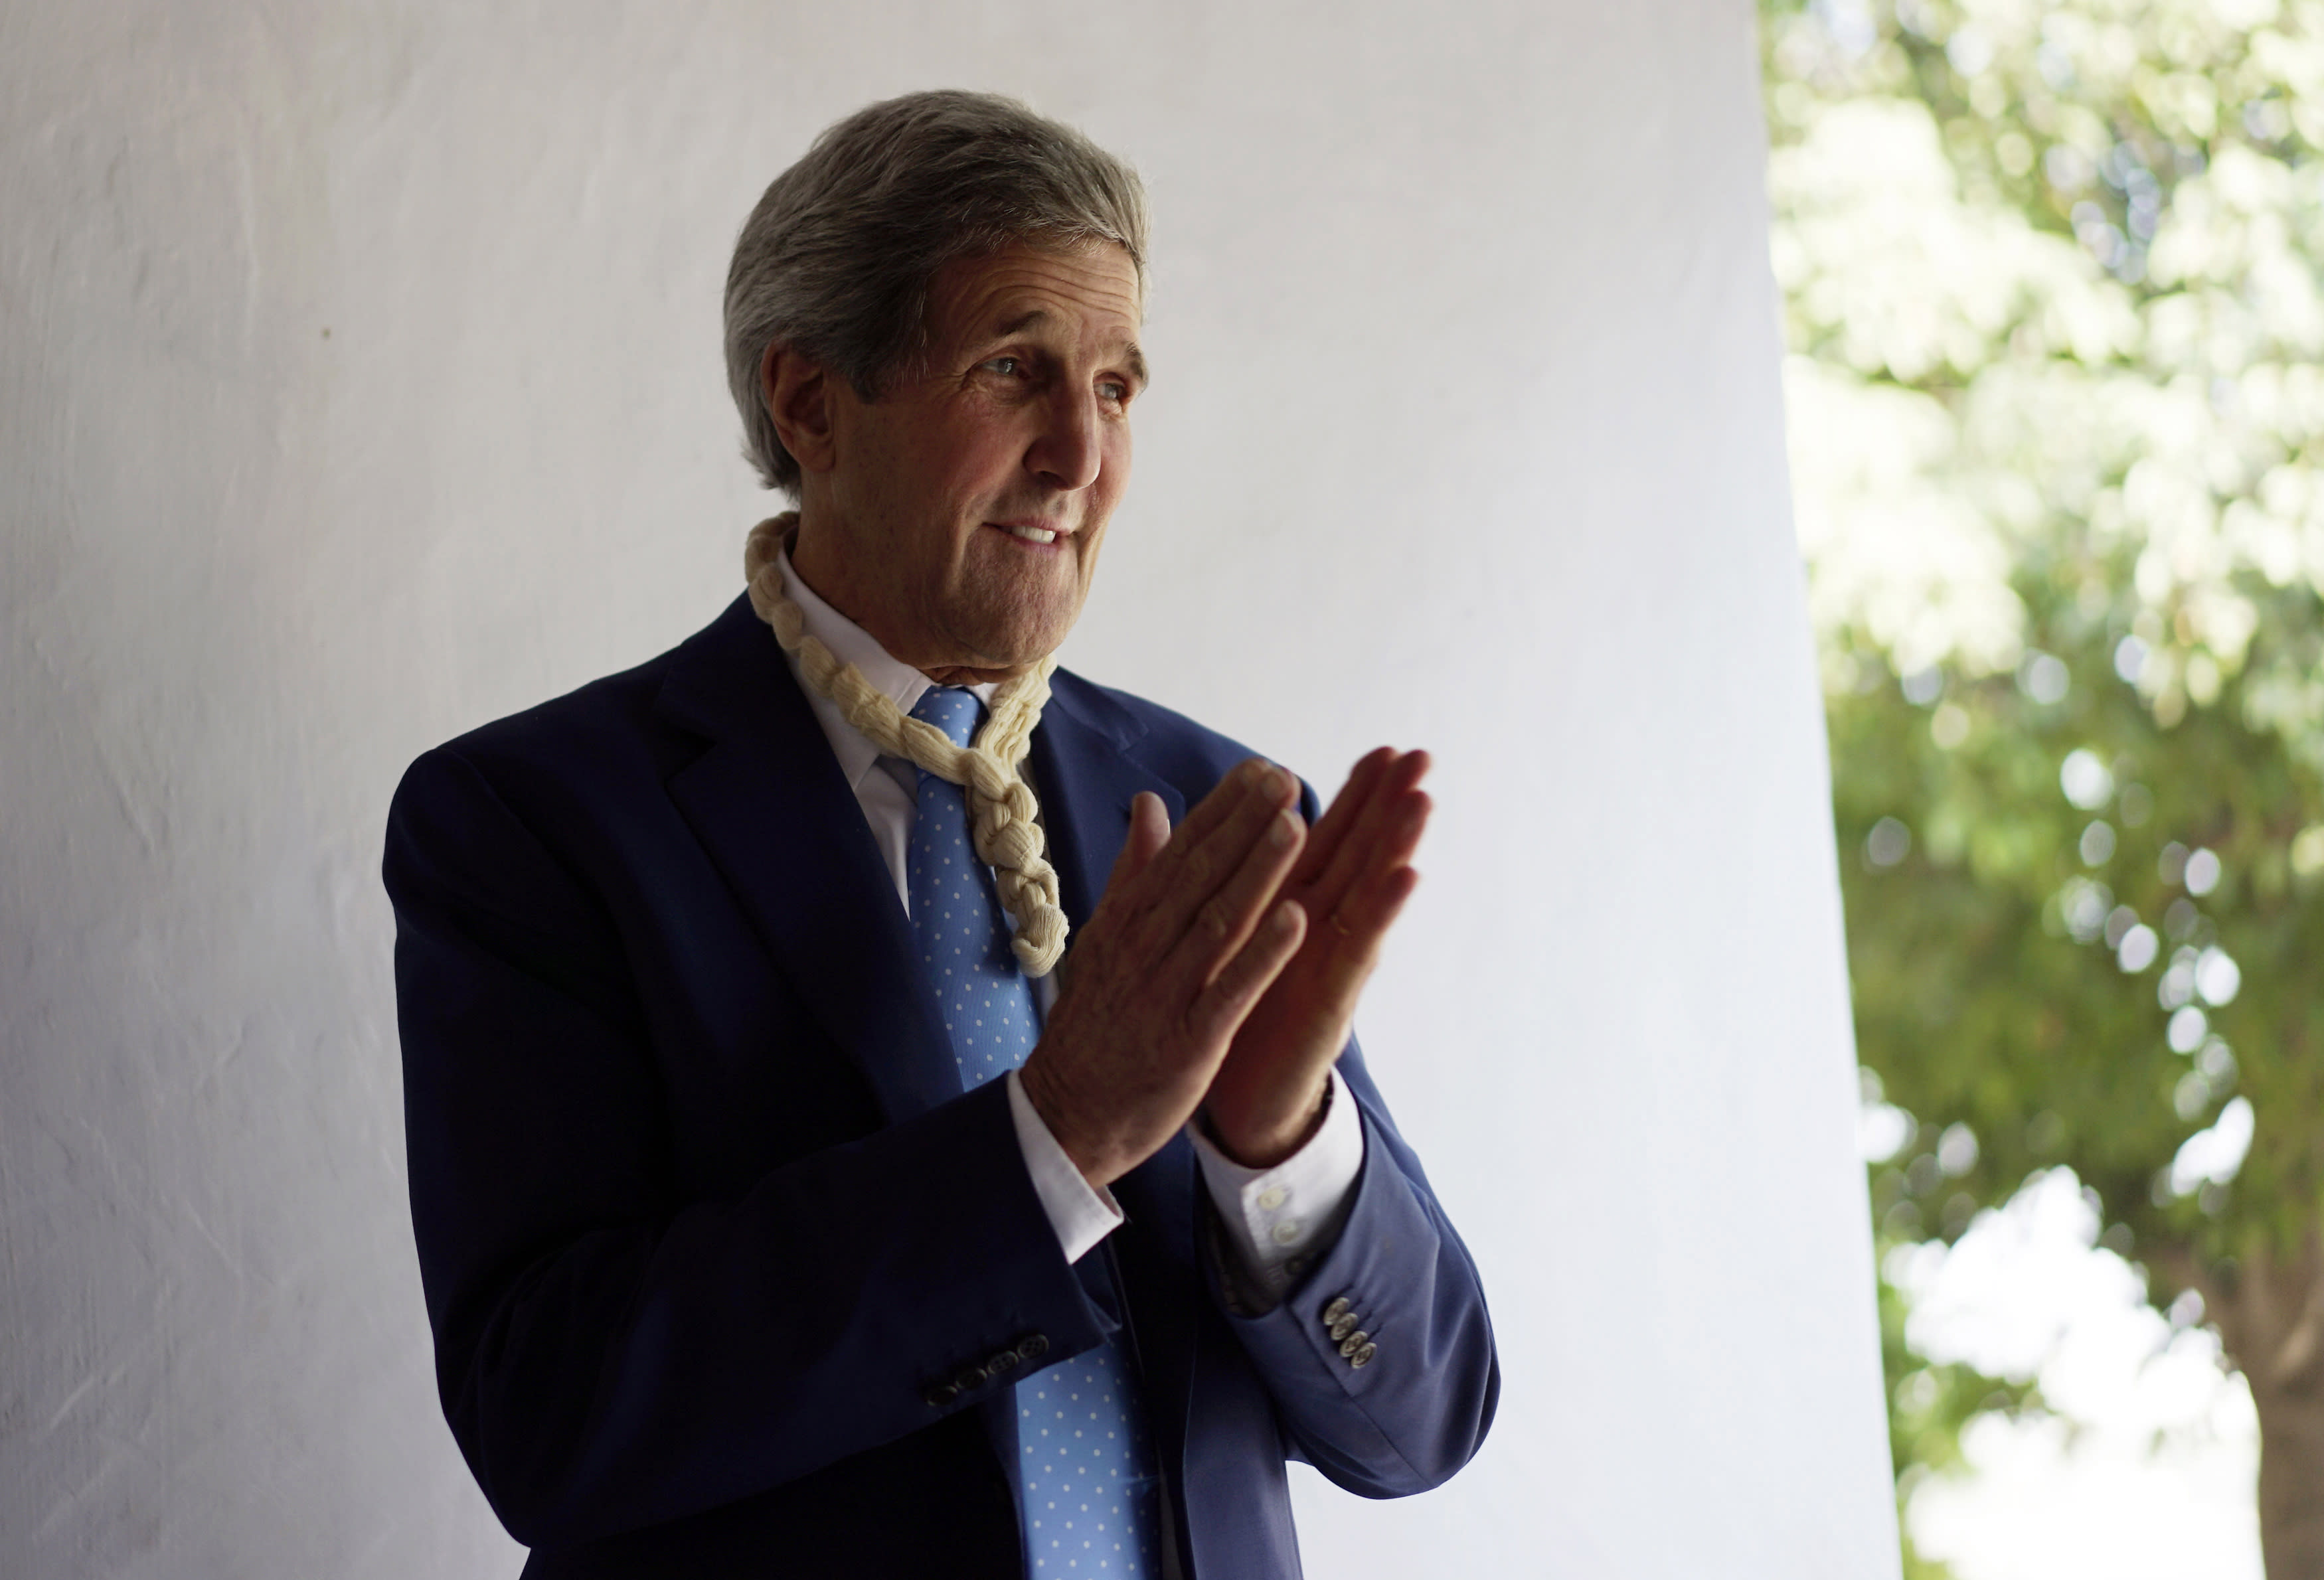 US Secretary of State John Kerry tours the Gandhi Ashram in Ahmedabad January 11, 2015